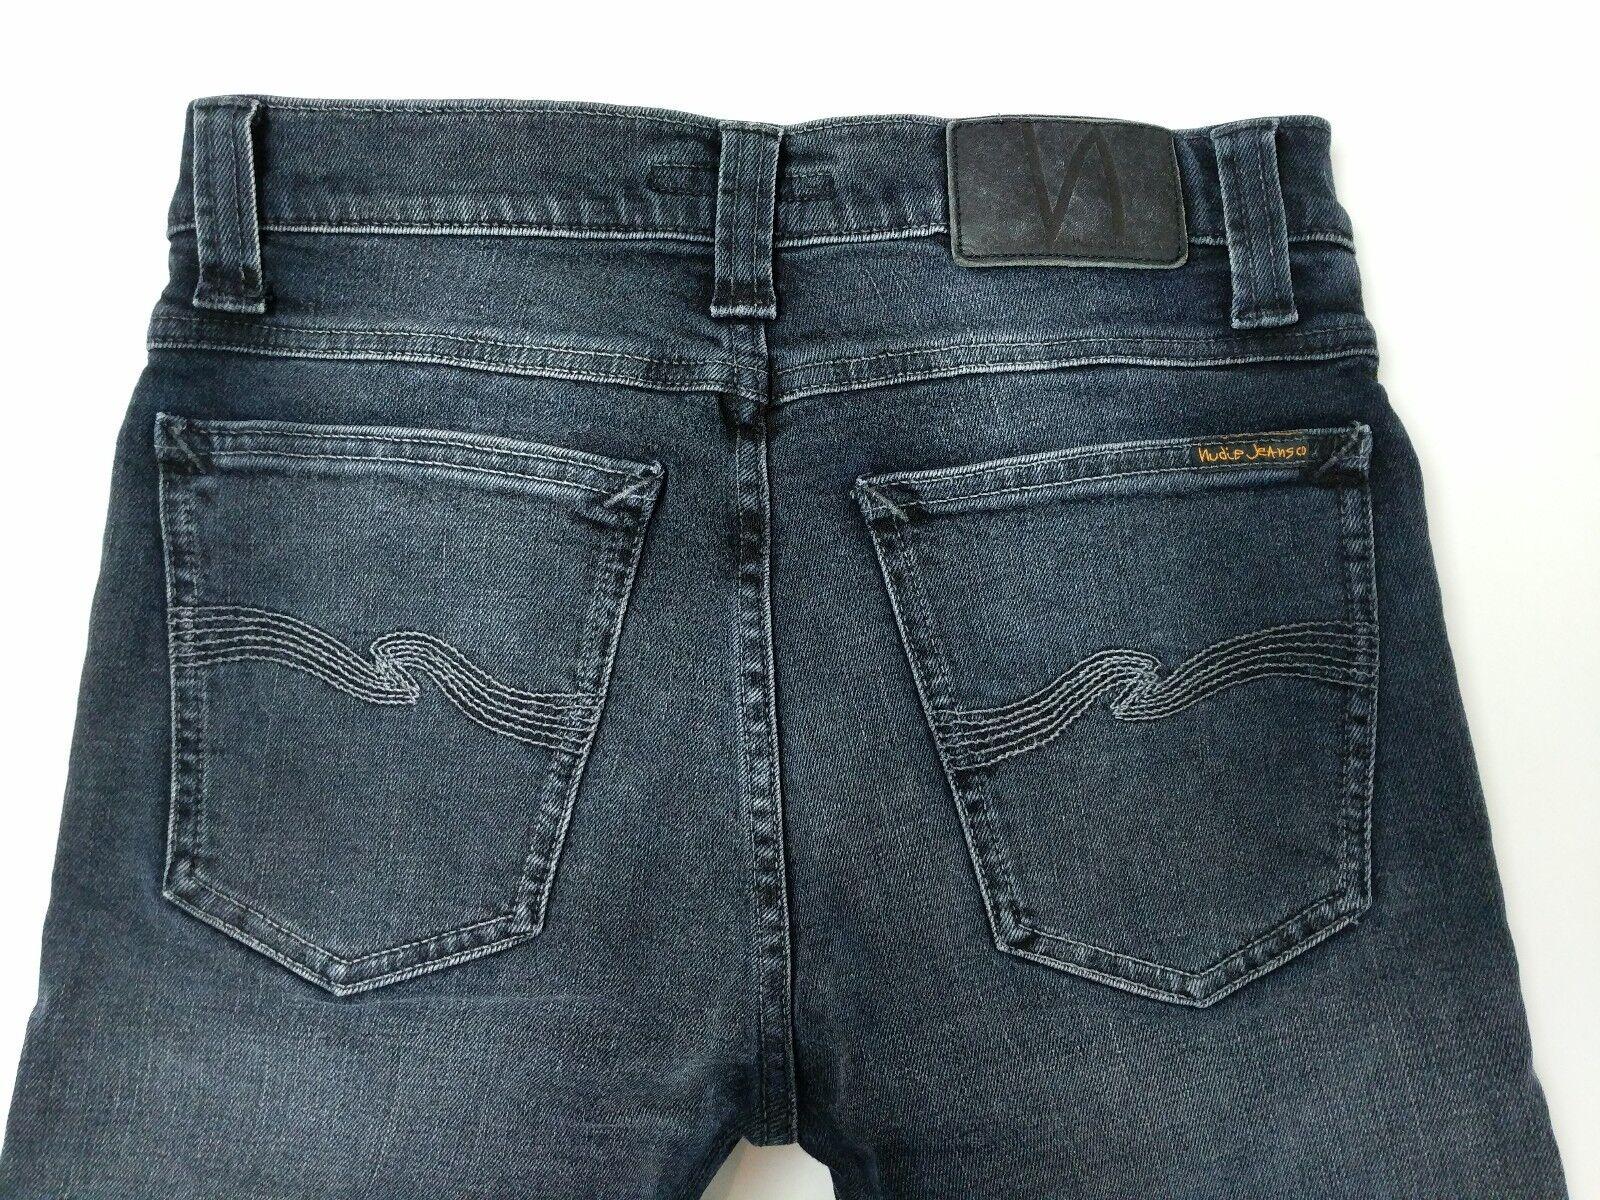 Nudie Jeans High Kai Organic Cotton Mens Stretch Jeans Slim Skinny Fit W28 L30